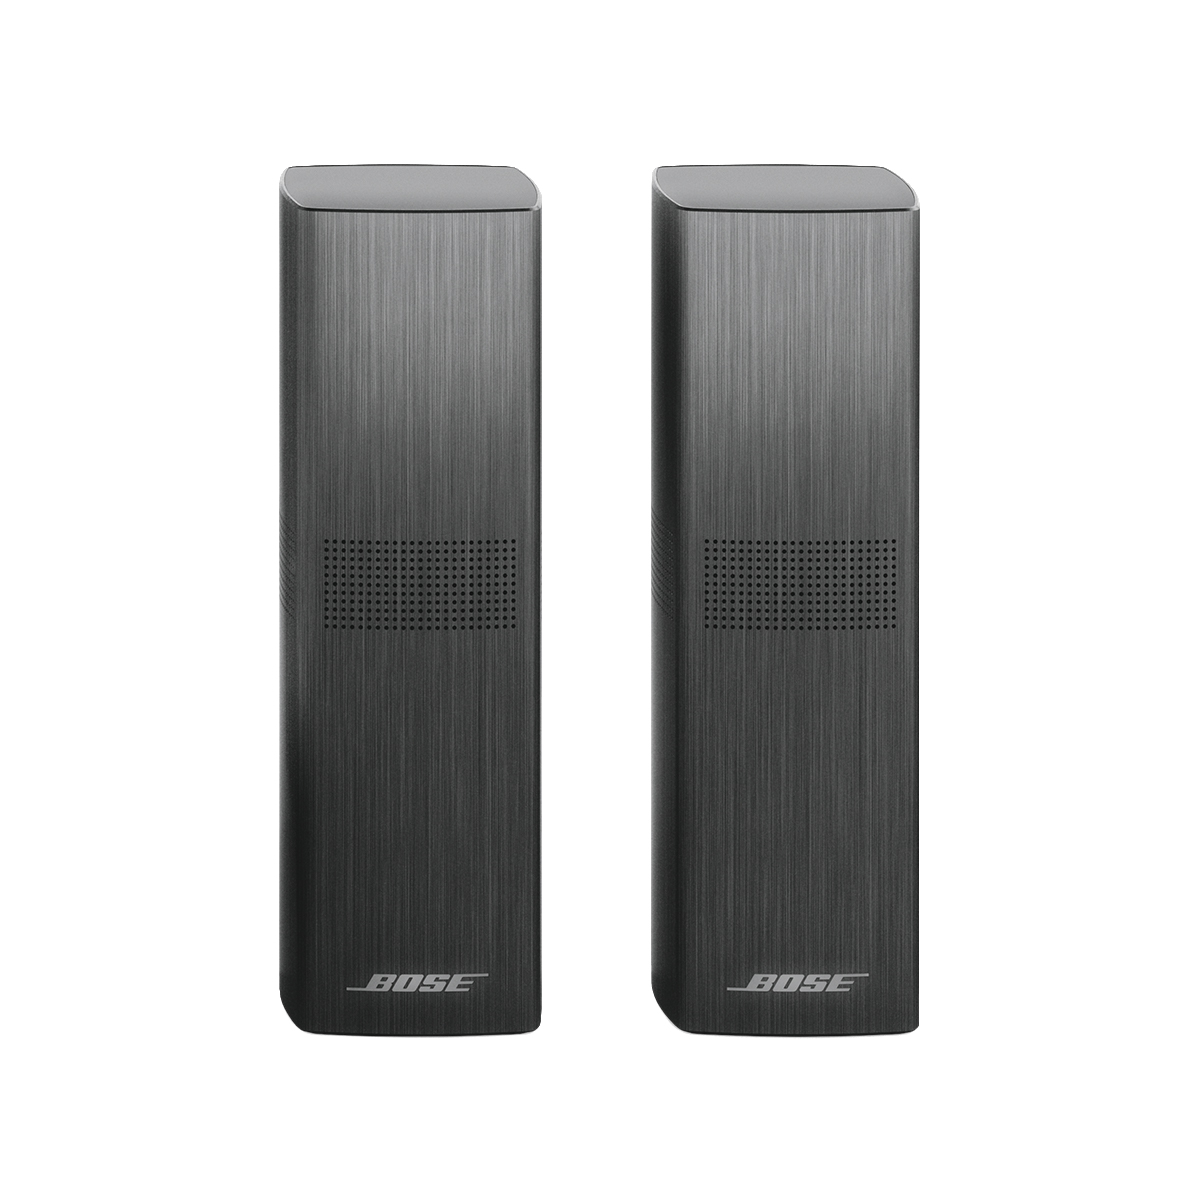 Bose Surround Speakers 700 (Black)